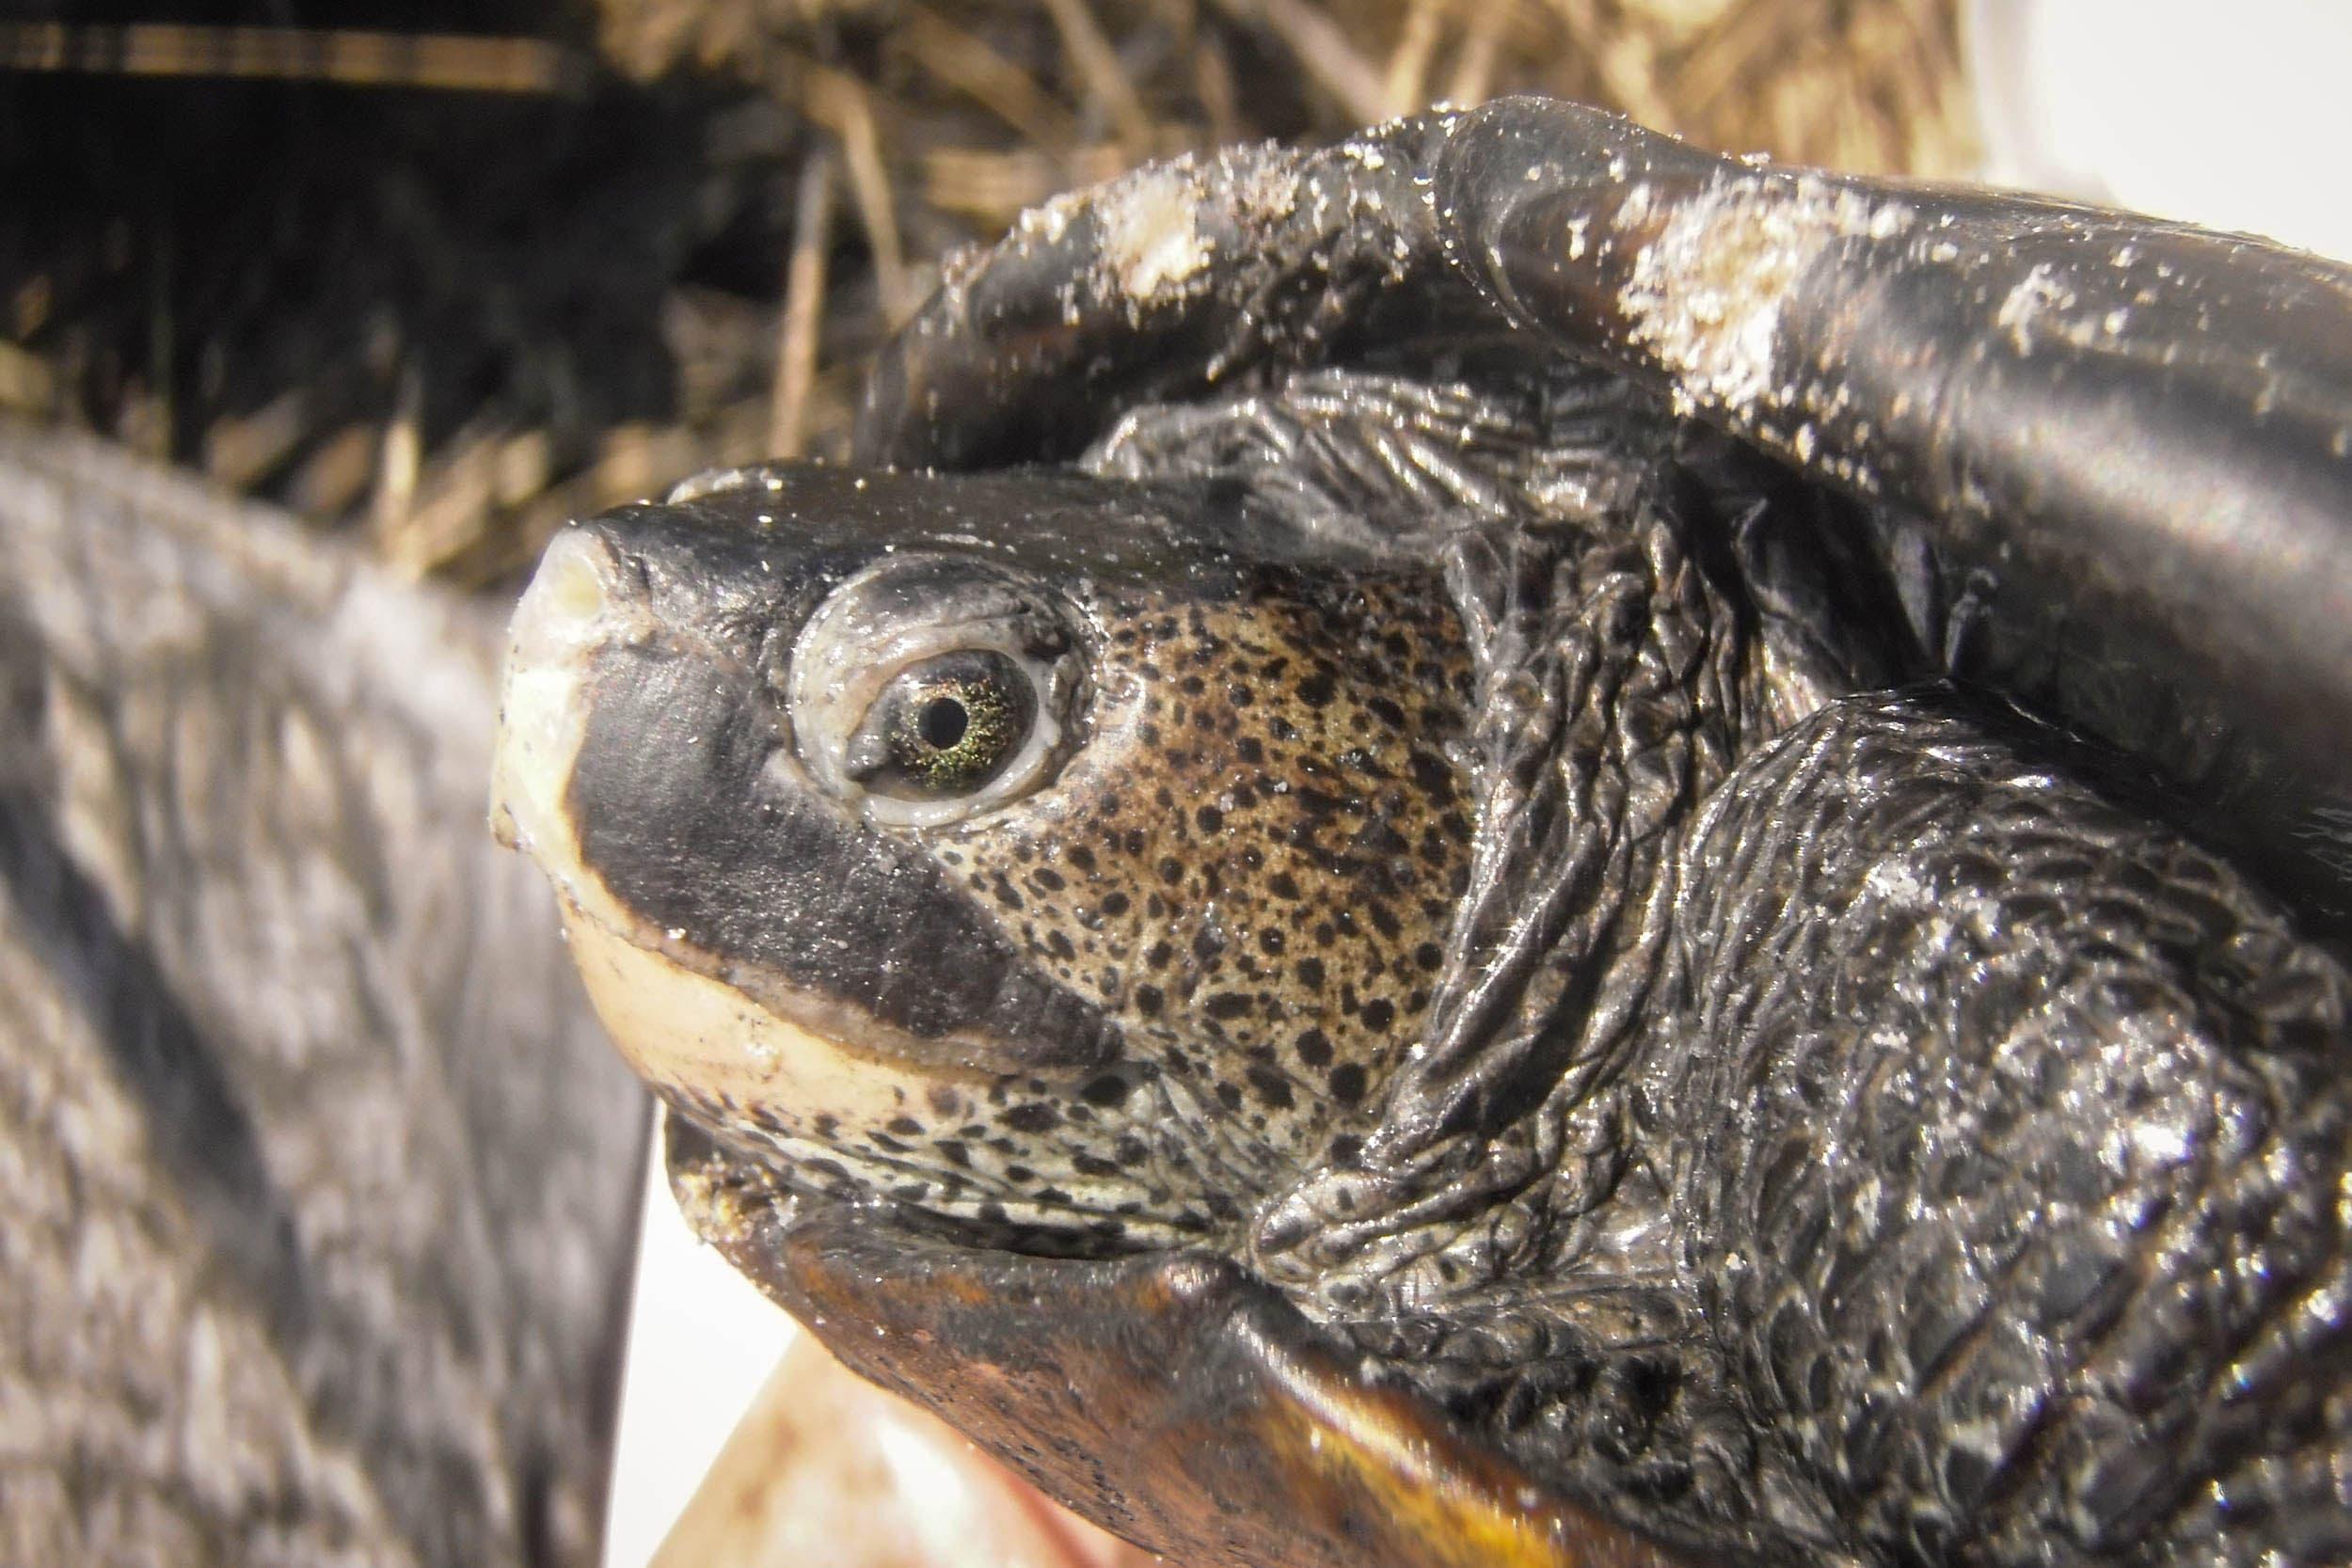 Texas Diamond-backed Terrapin (Malaclemys terrapin littoralis)